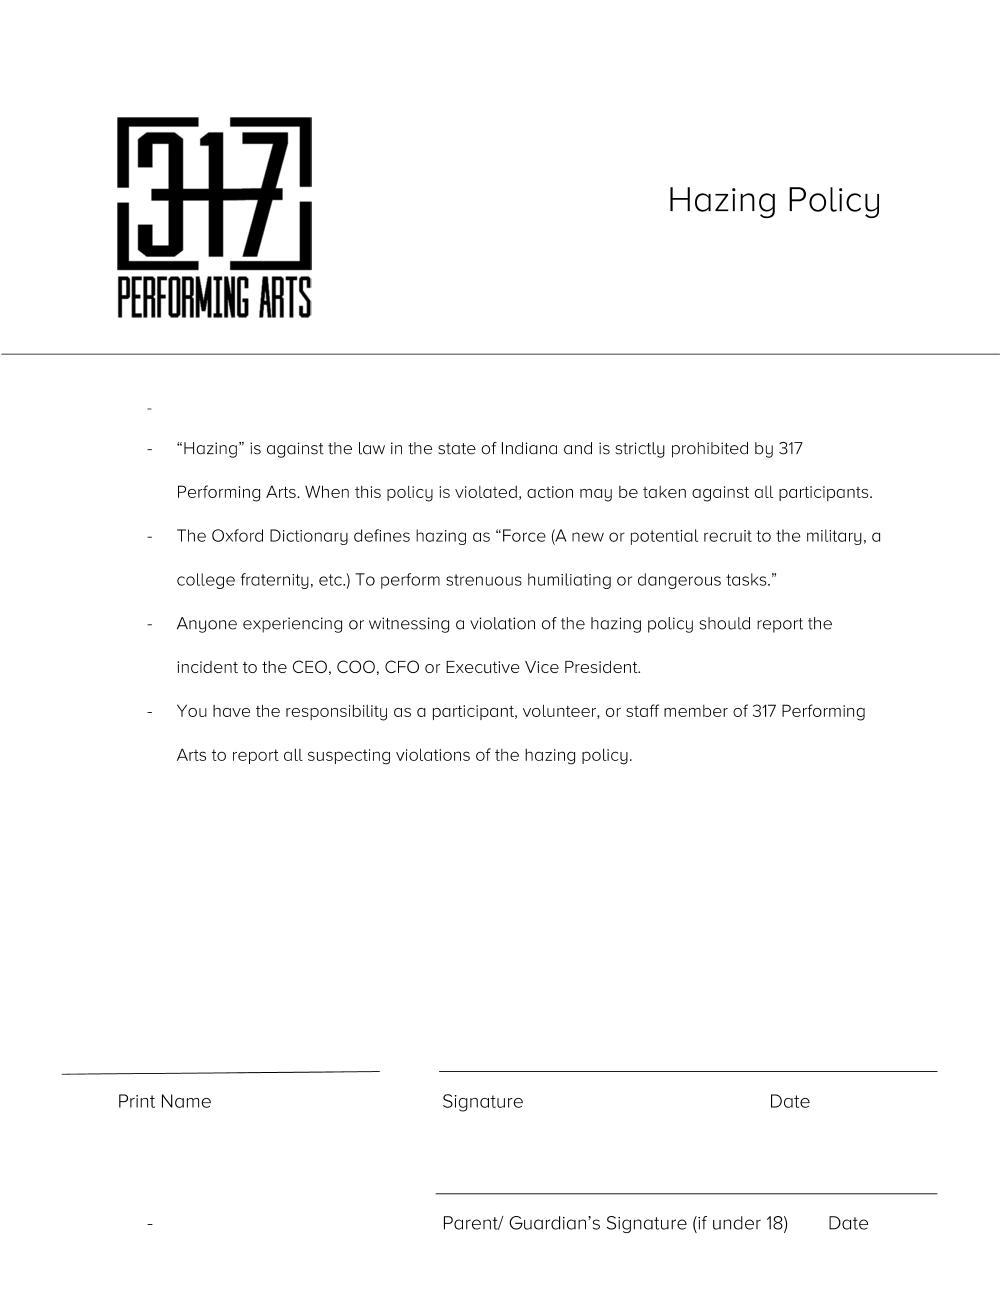 Hazing Policy.jpg